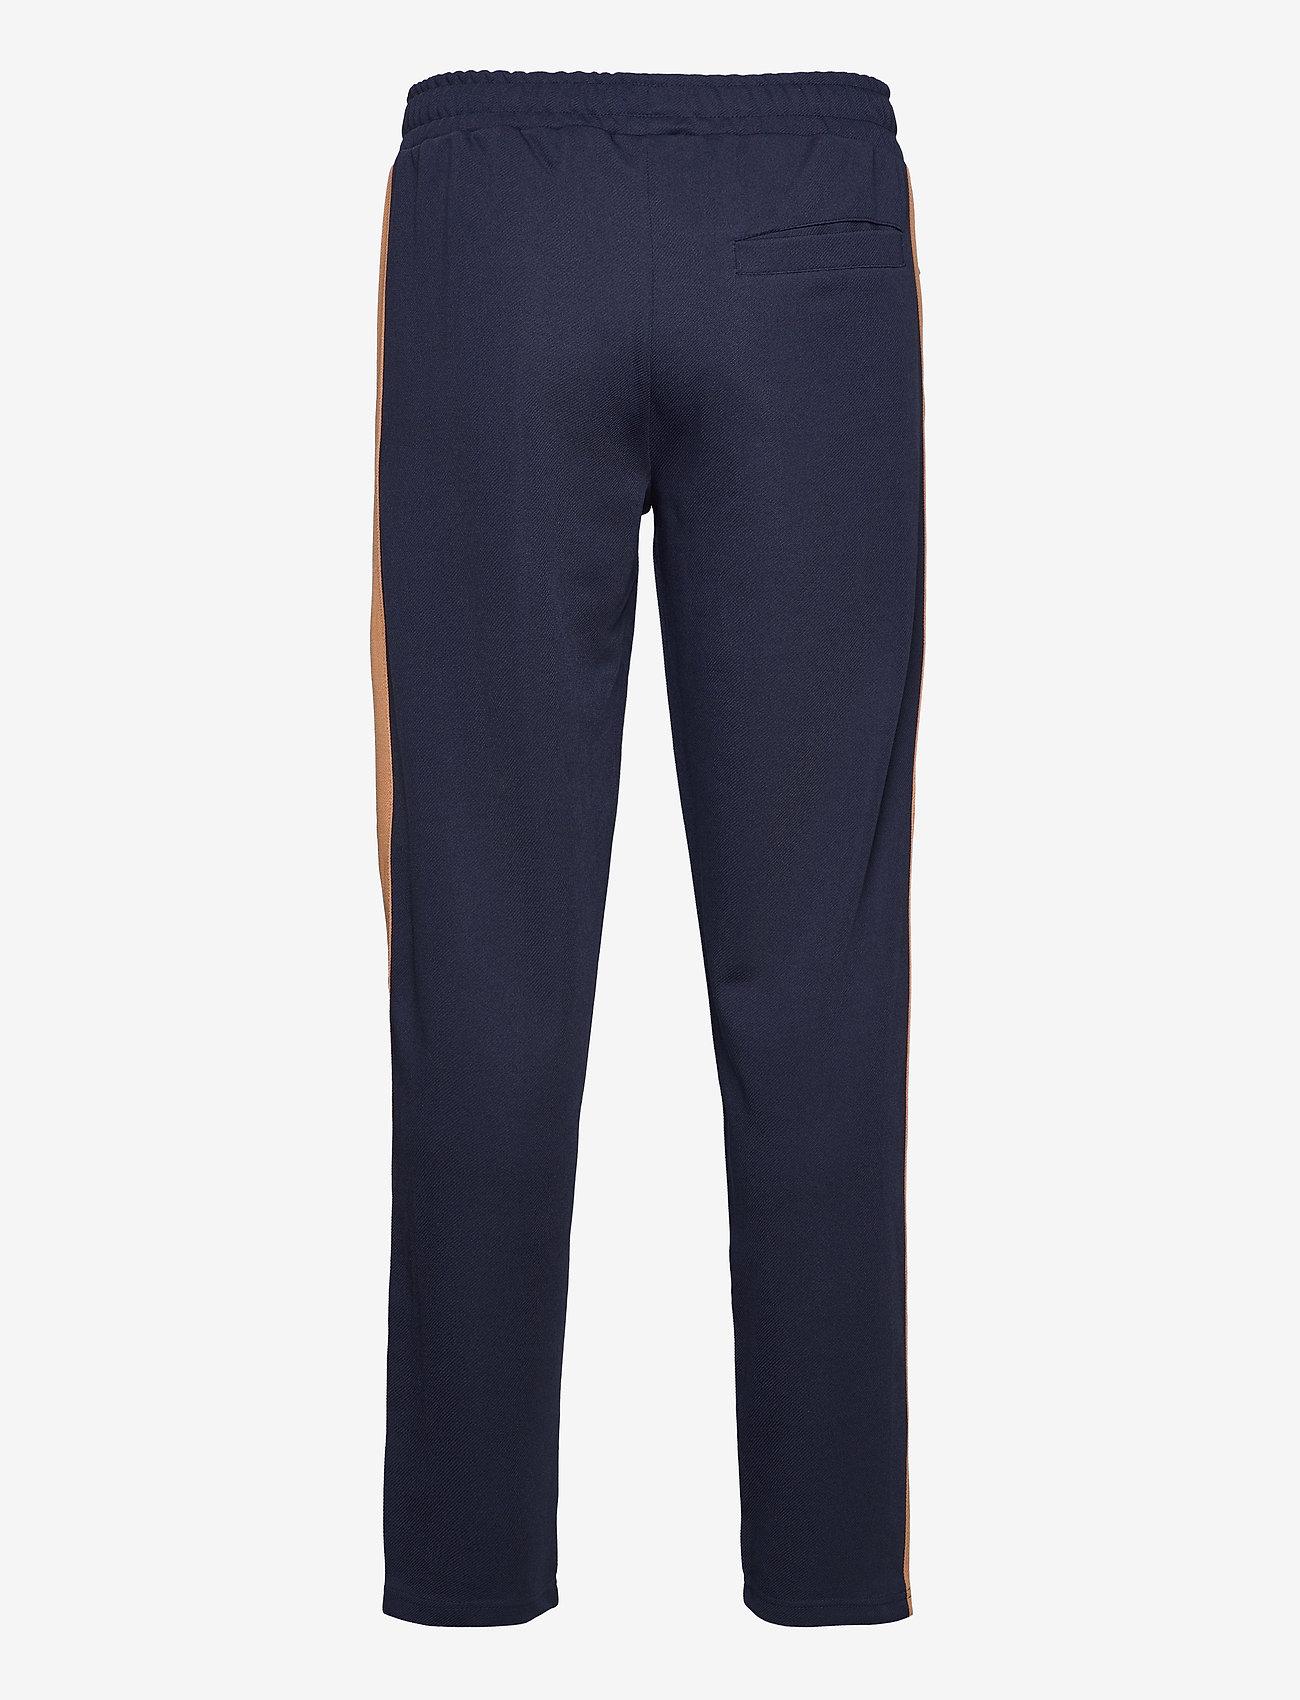 FILA - MEN HAVERD track pants - sale - black iris-hazel - 1